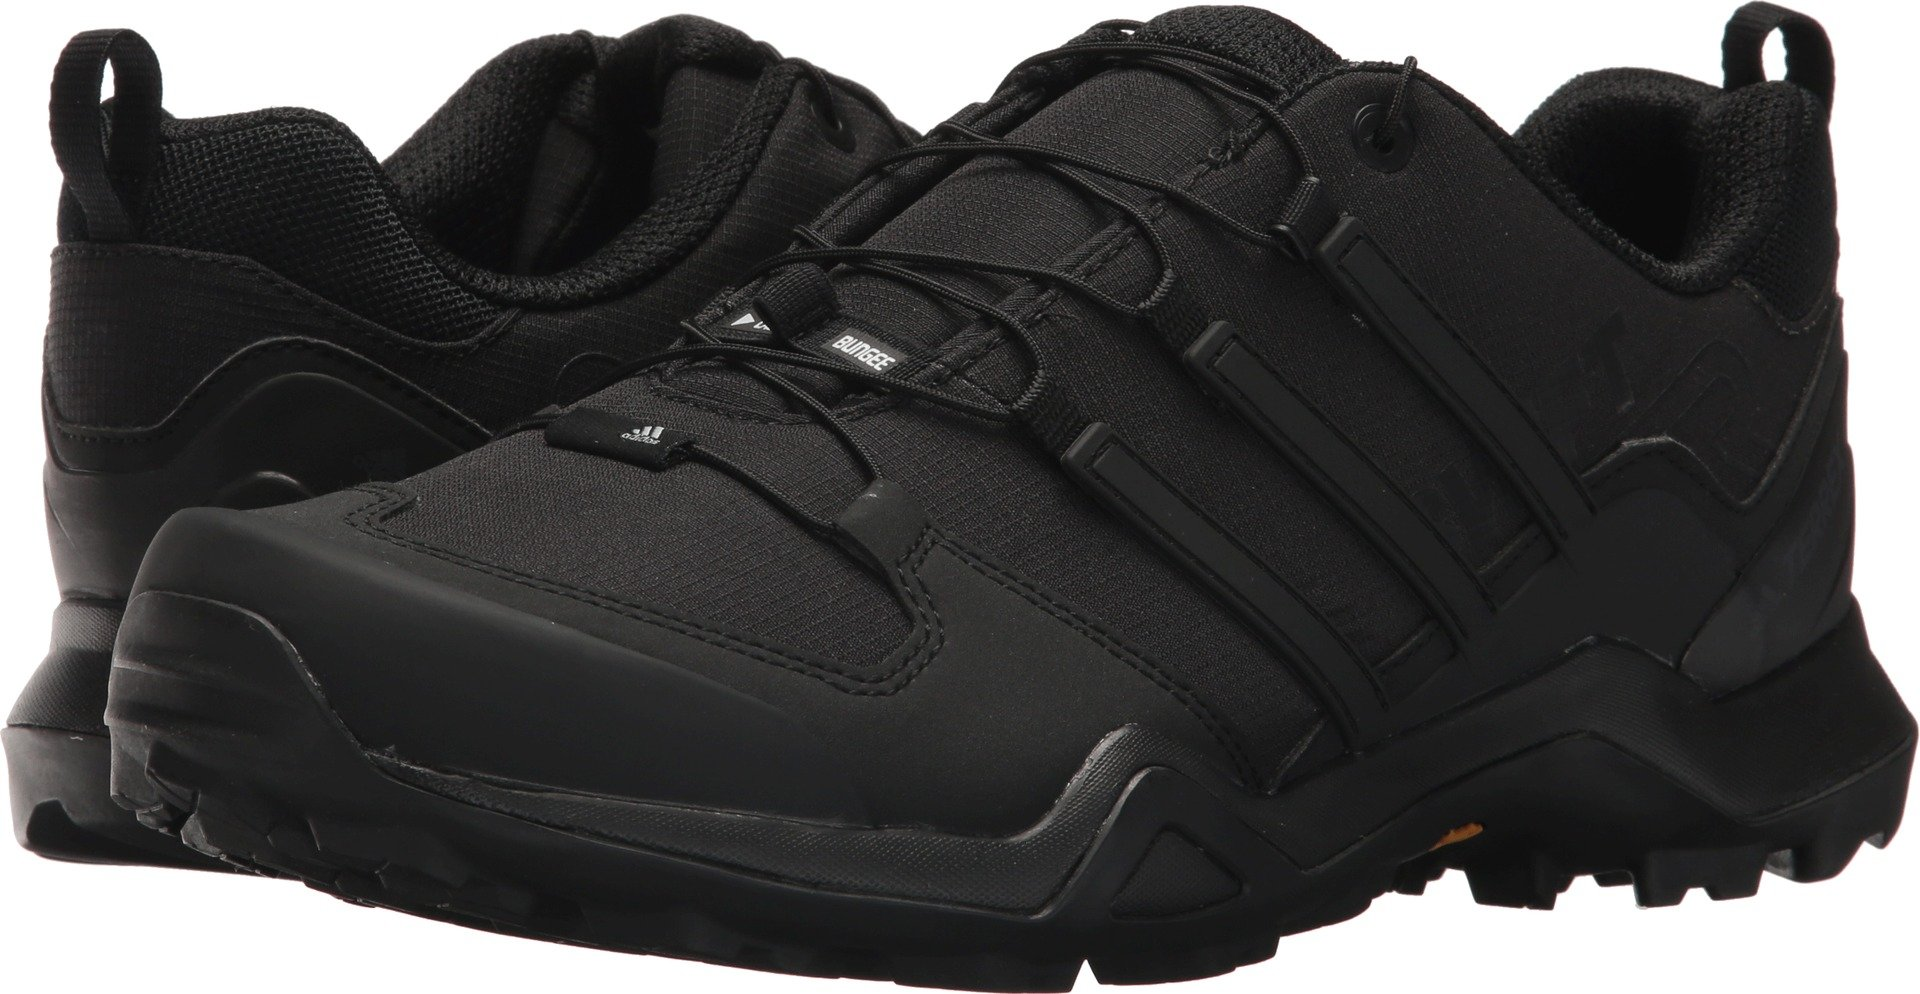 adidas outdoor Mens Terrex Swift R2 Shoe (11 - Black/Black/Black) by adidas